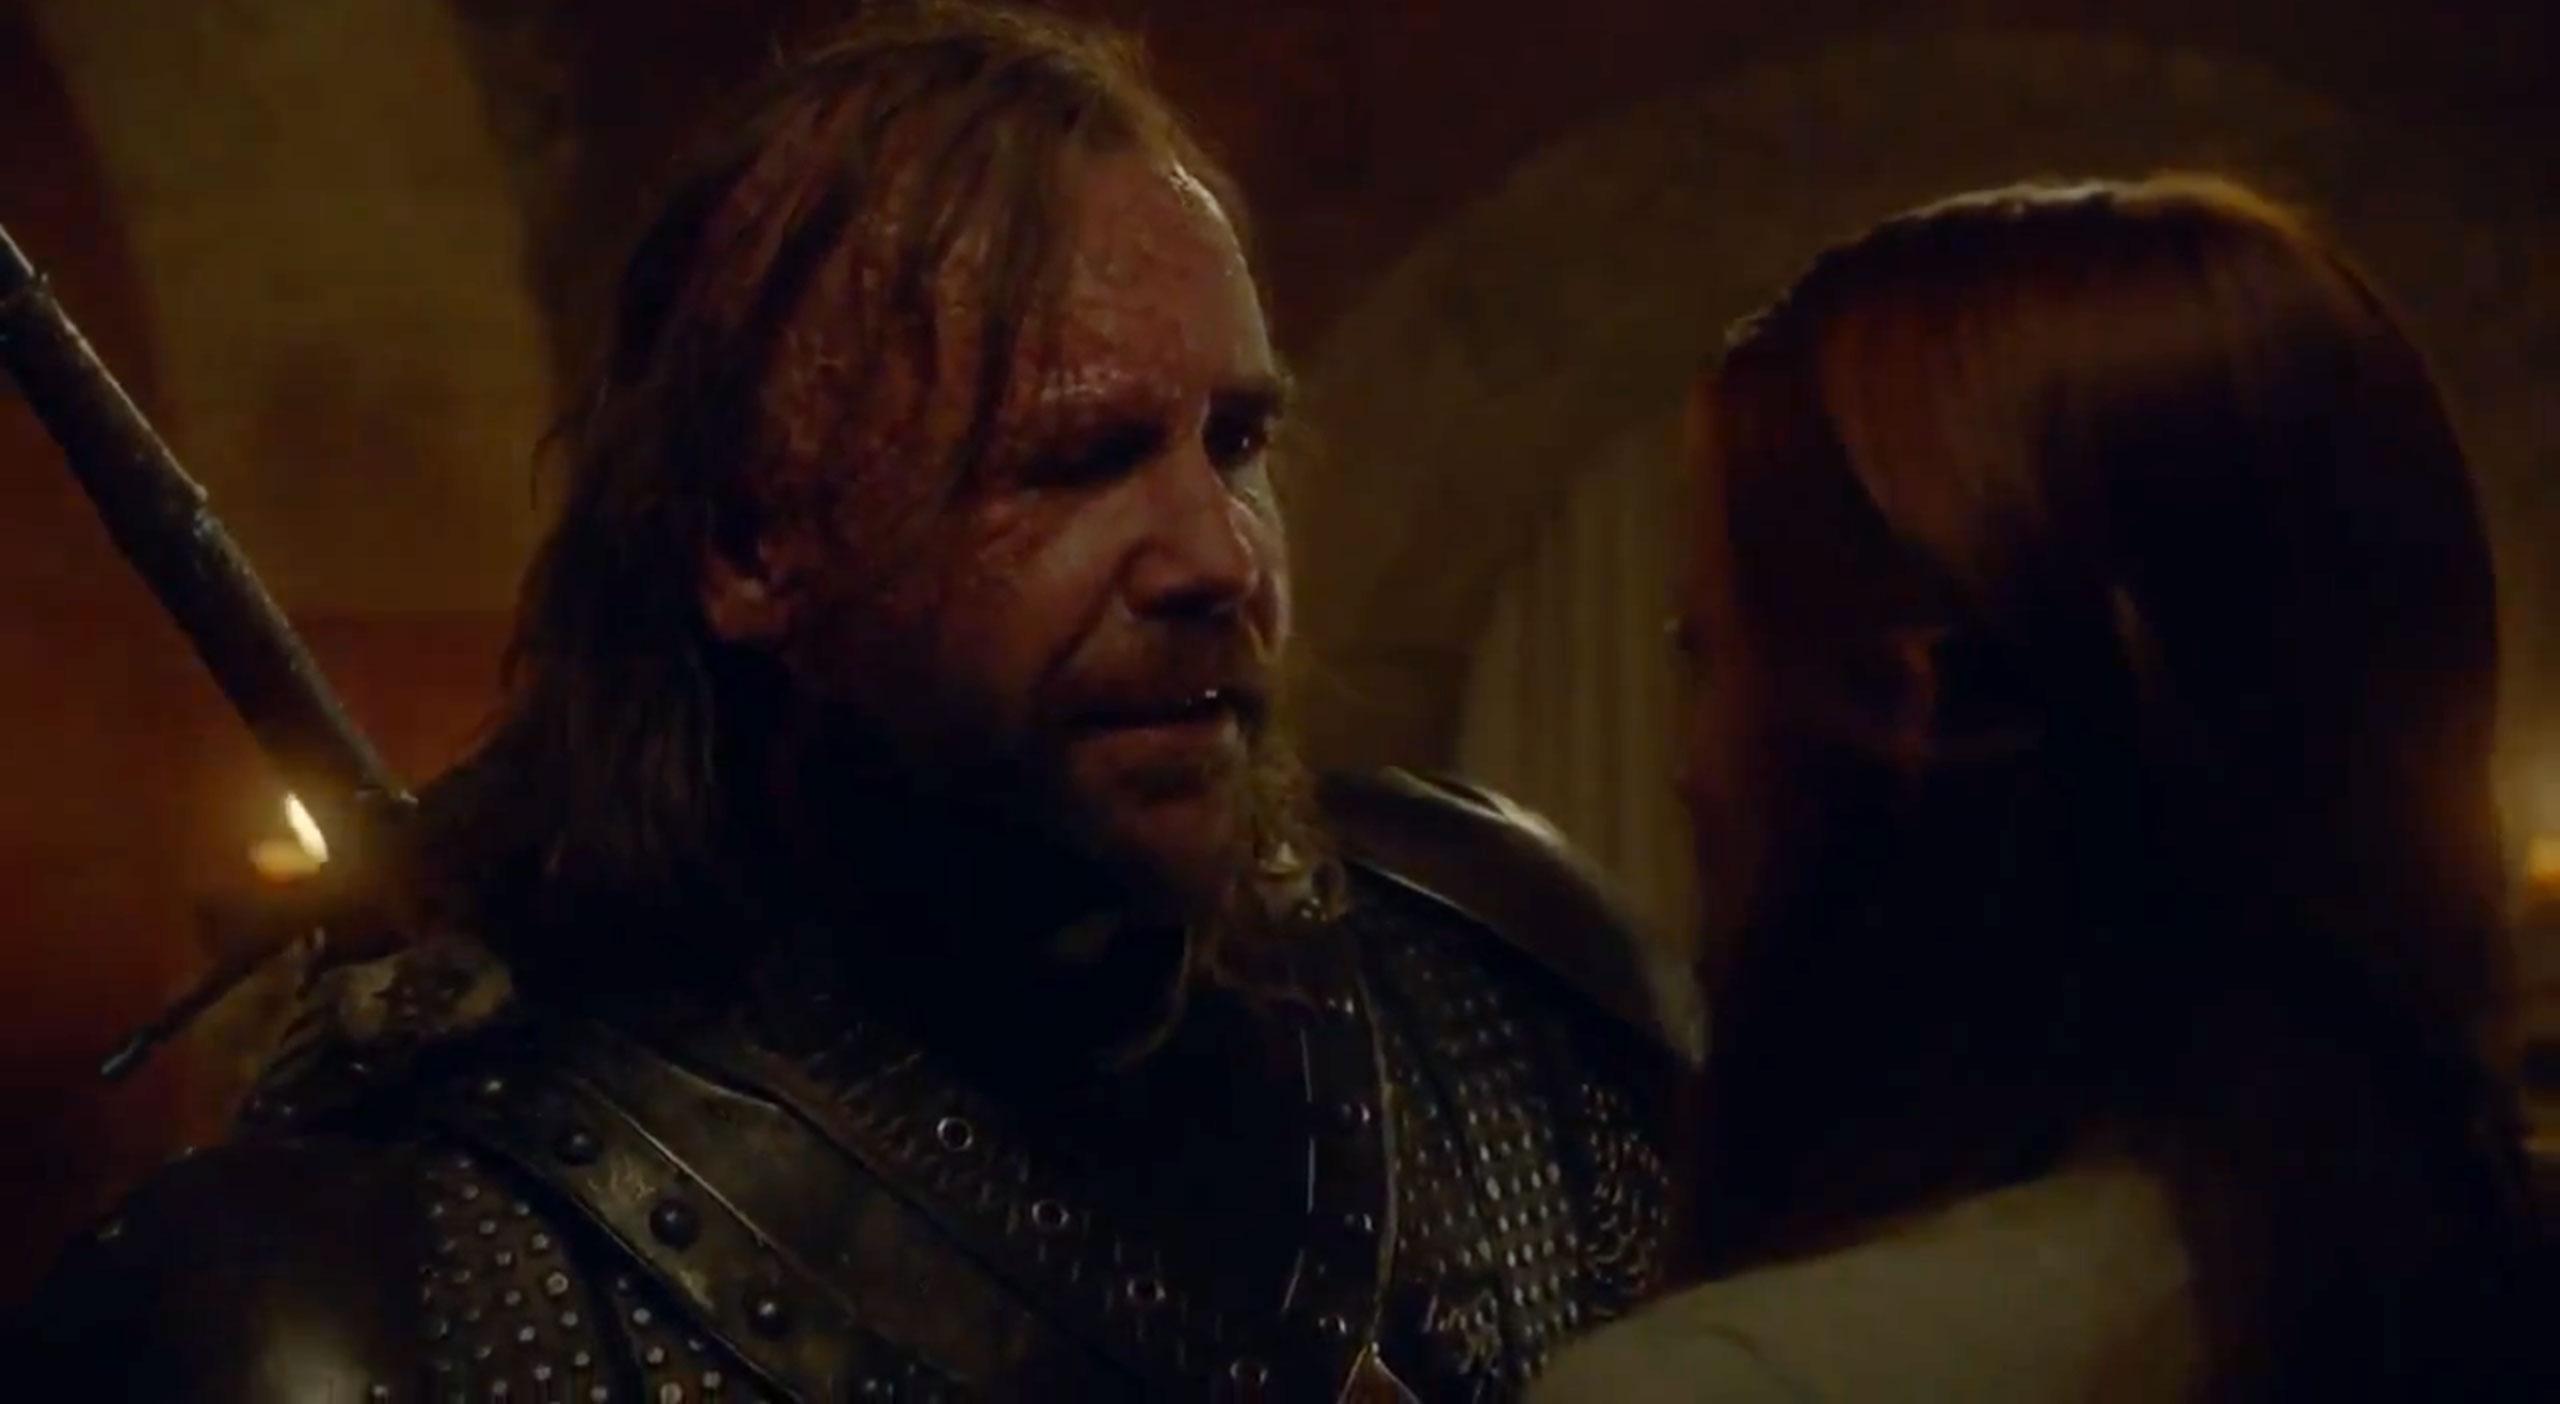 20-game-of-thrones-deleted-scene jpgGame Of Thrones Girl Scenes